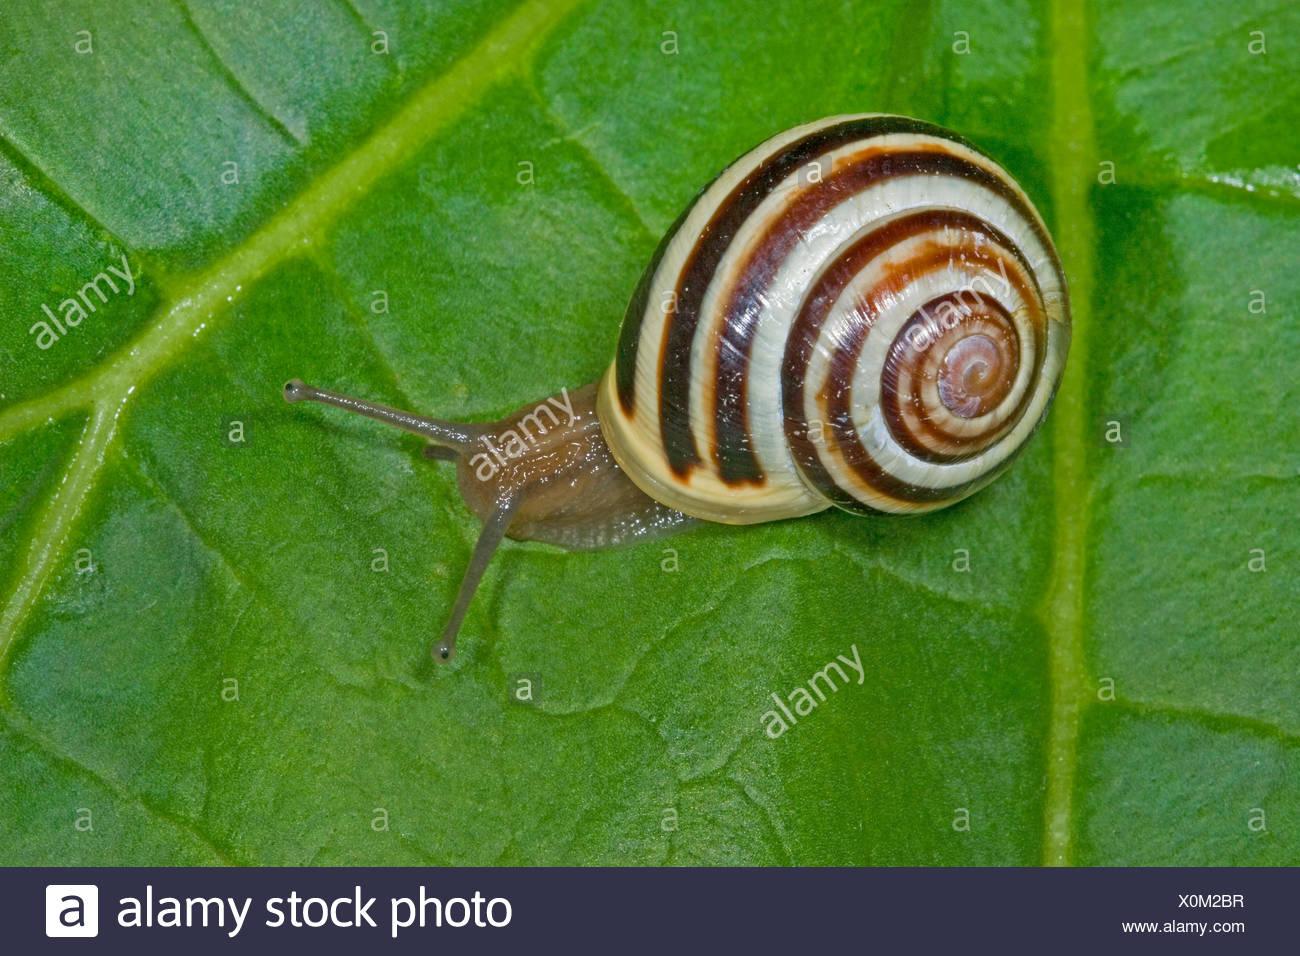 White-lip gardensnail, White-lipped snail, Garden snail, Smaller banded snail (Cepaea hortensis), banded snail on a leaf, Germany - Stock Image